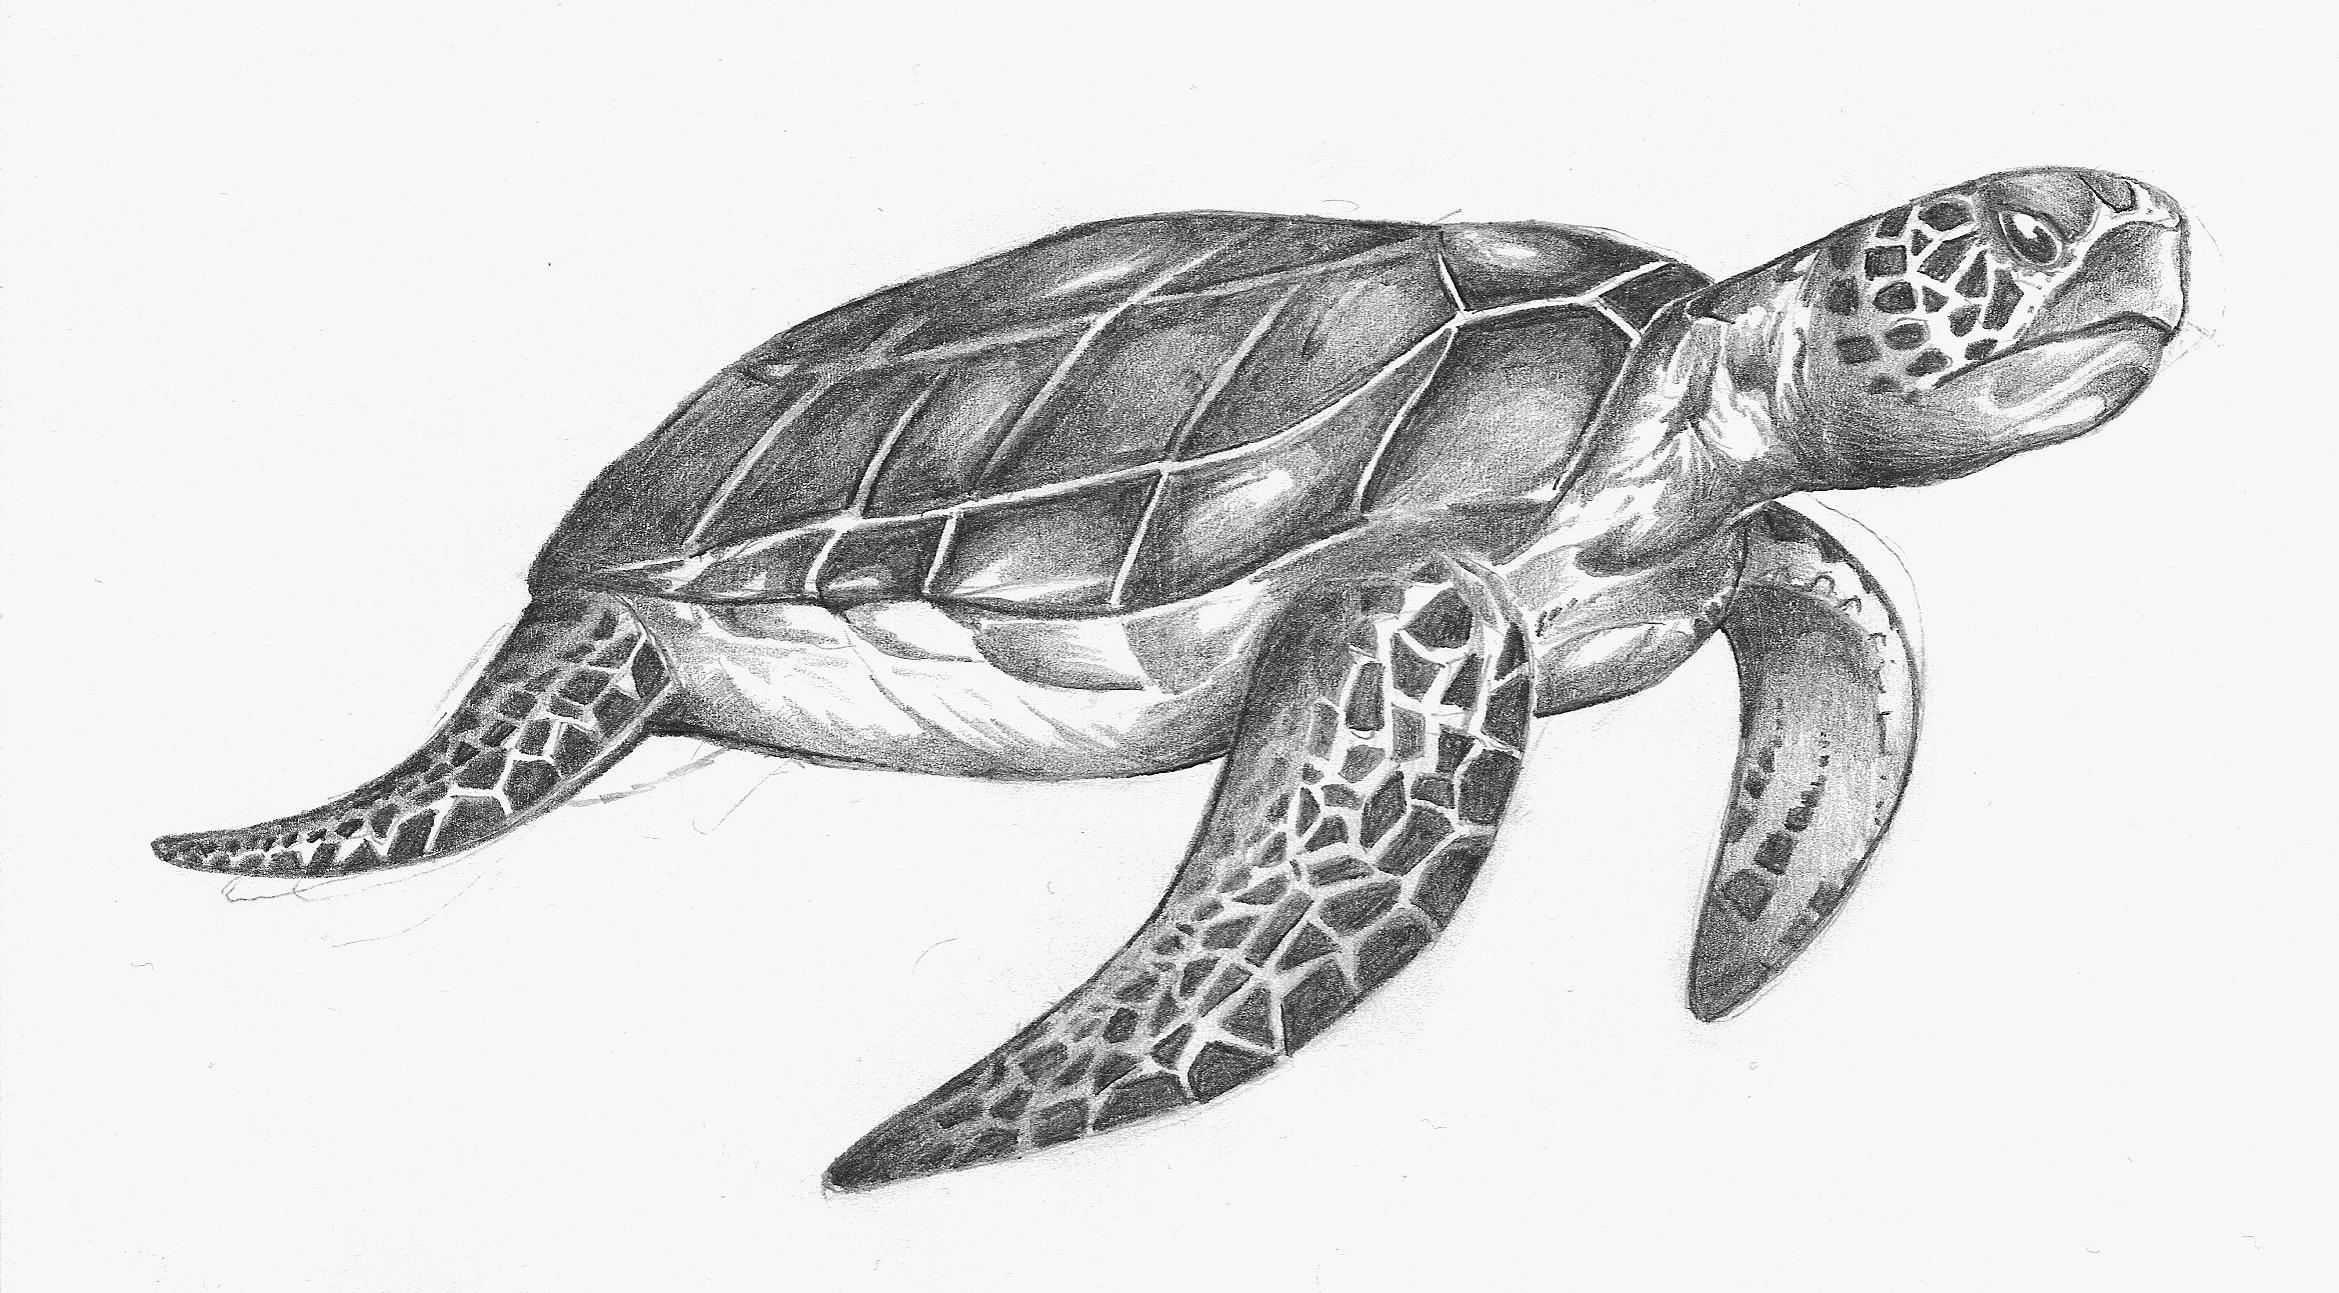 Explore Drawing Sea Turtle Sea turtle drawing, Turtle